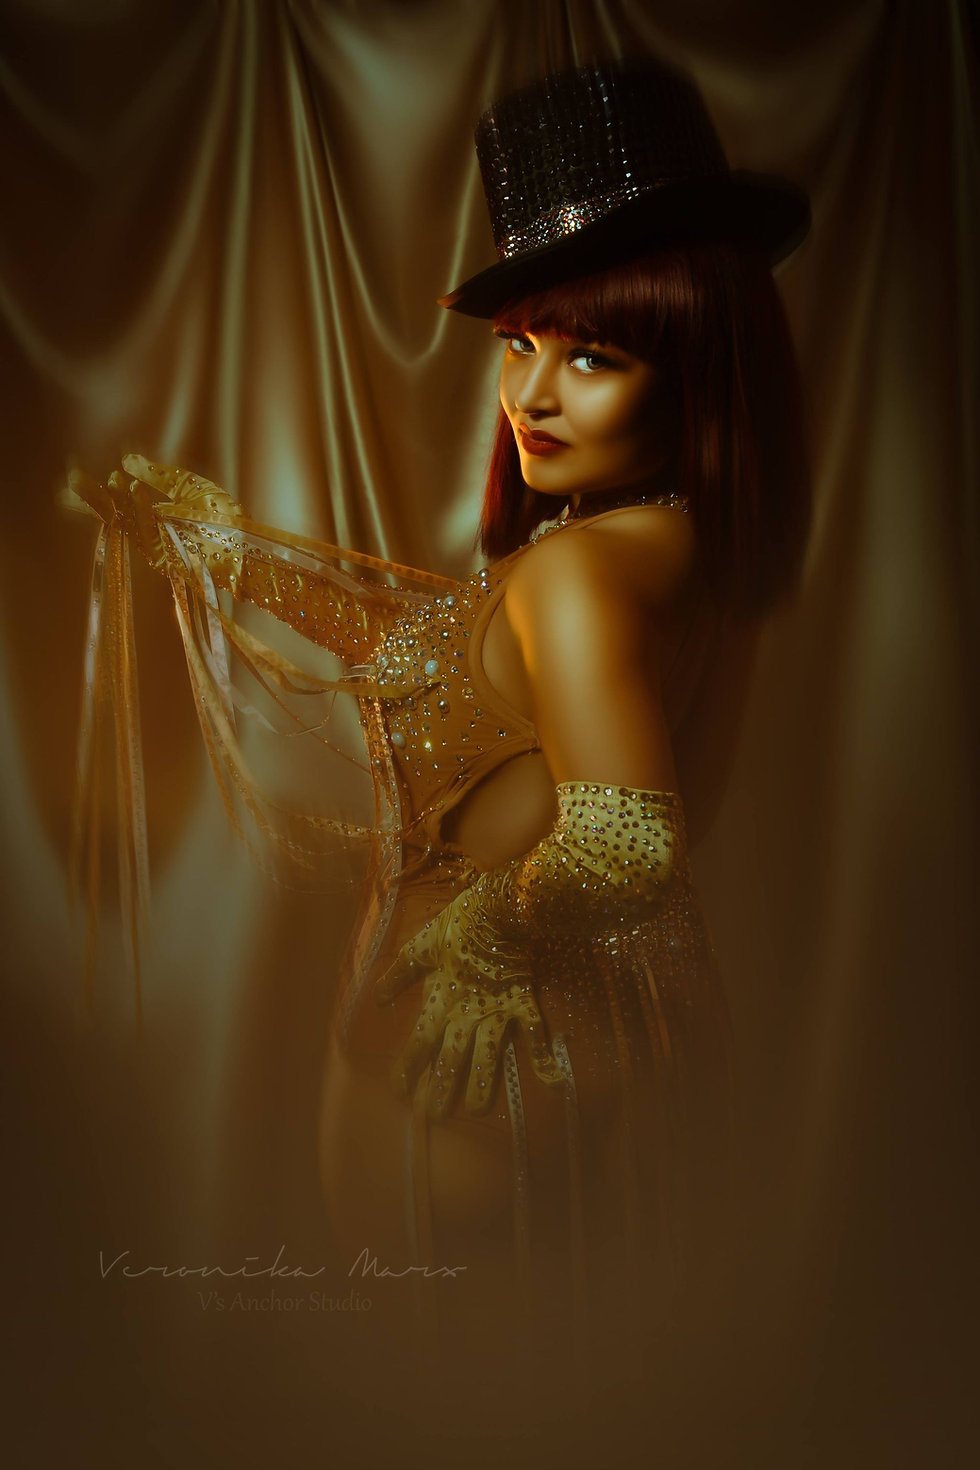 Cleopantha - Diamonds photos 2 - Veronika Marx.jpg